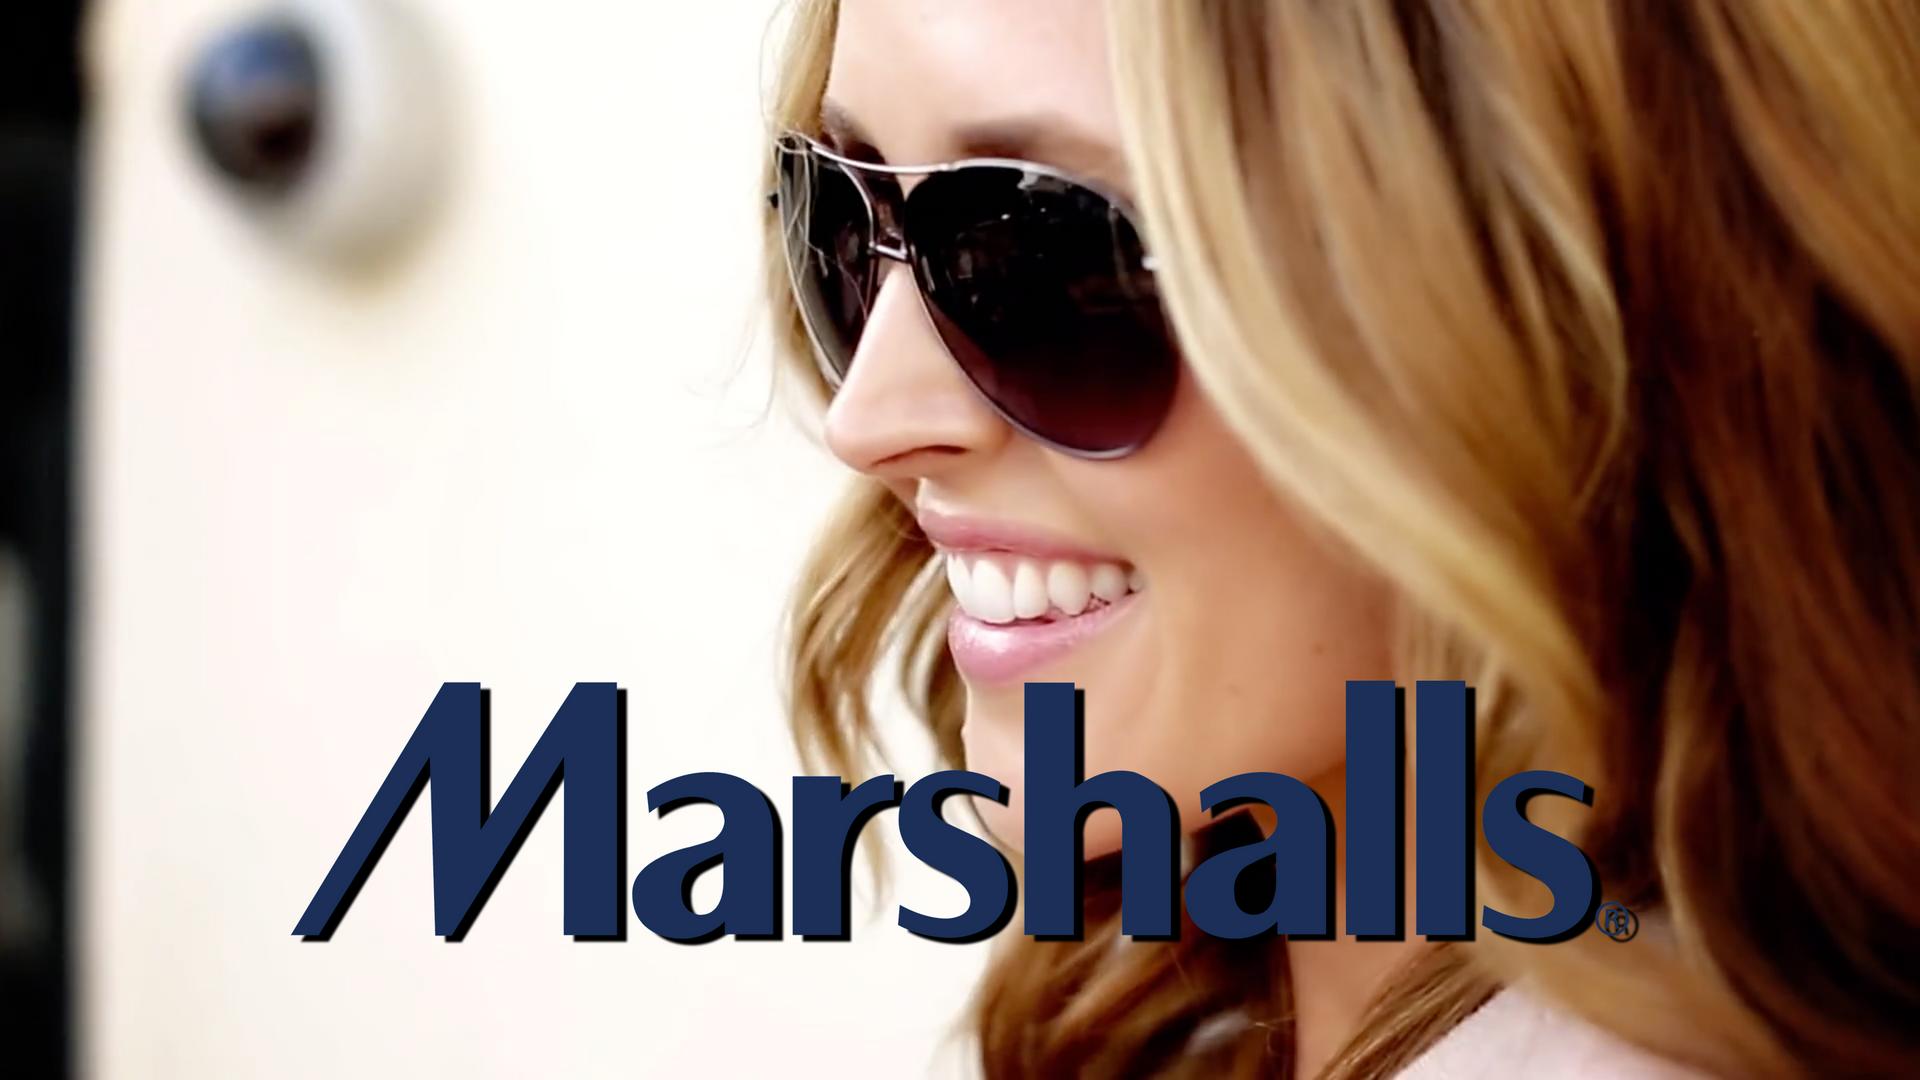 MARSHALLS 4.png